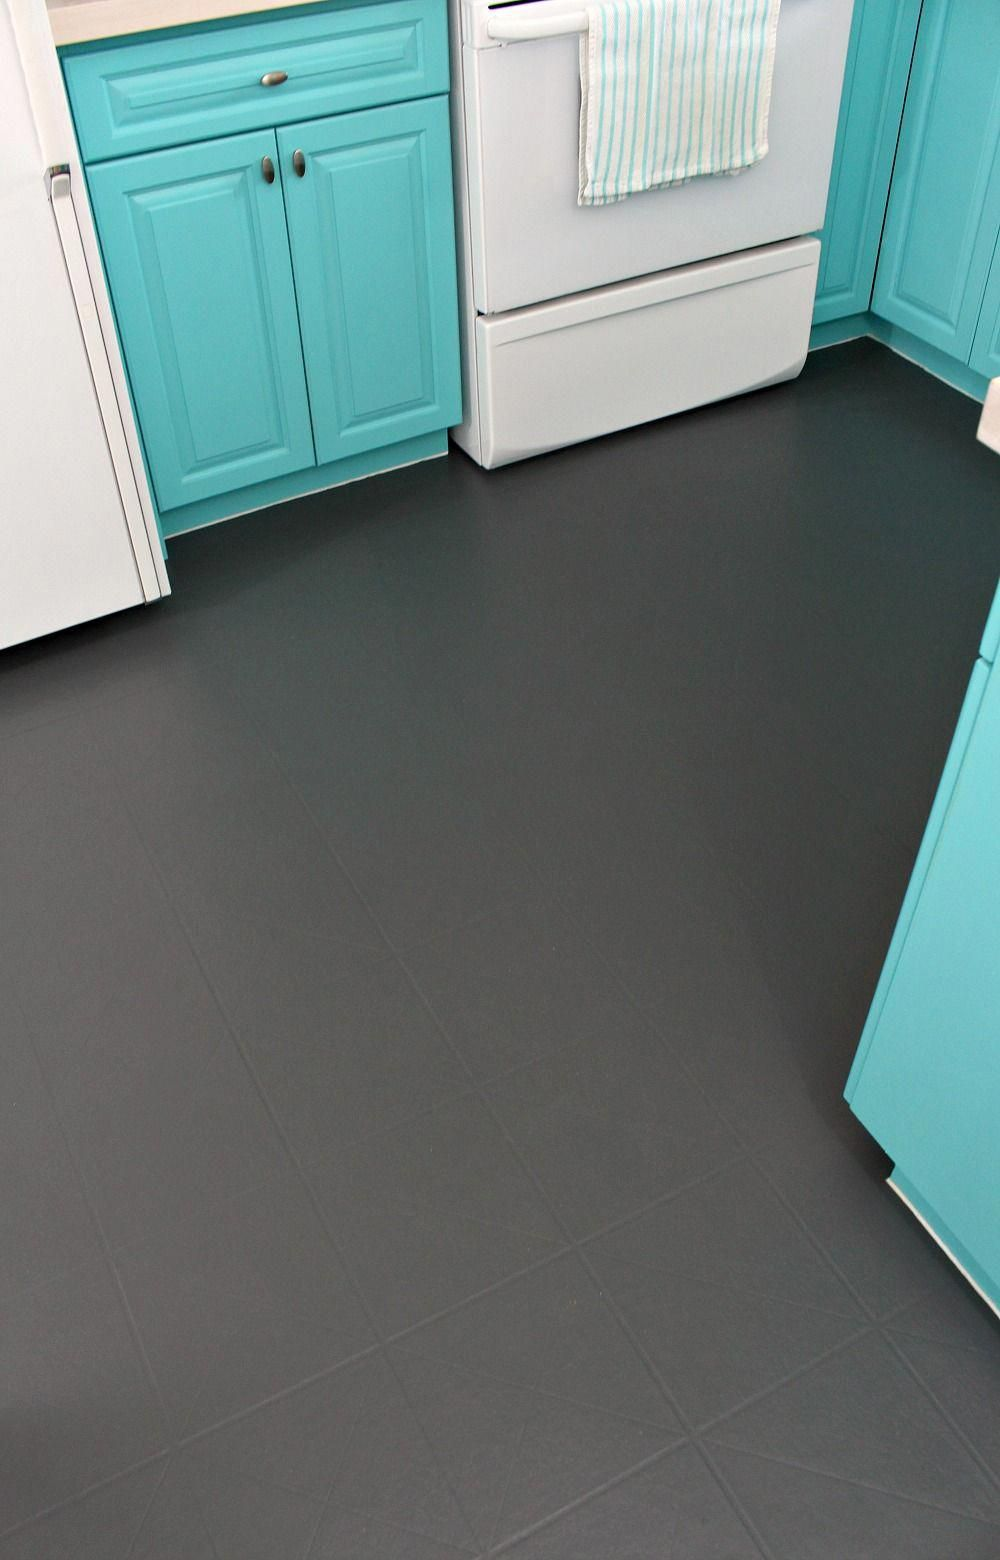 How to Paint a Vinyl Floor DIY Painted Floors